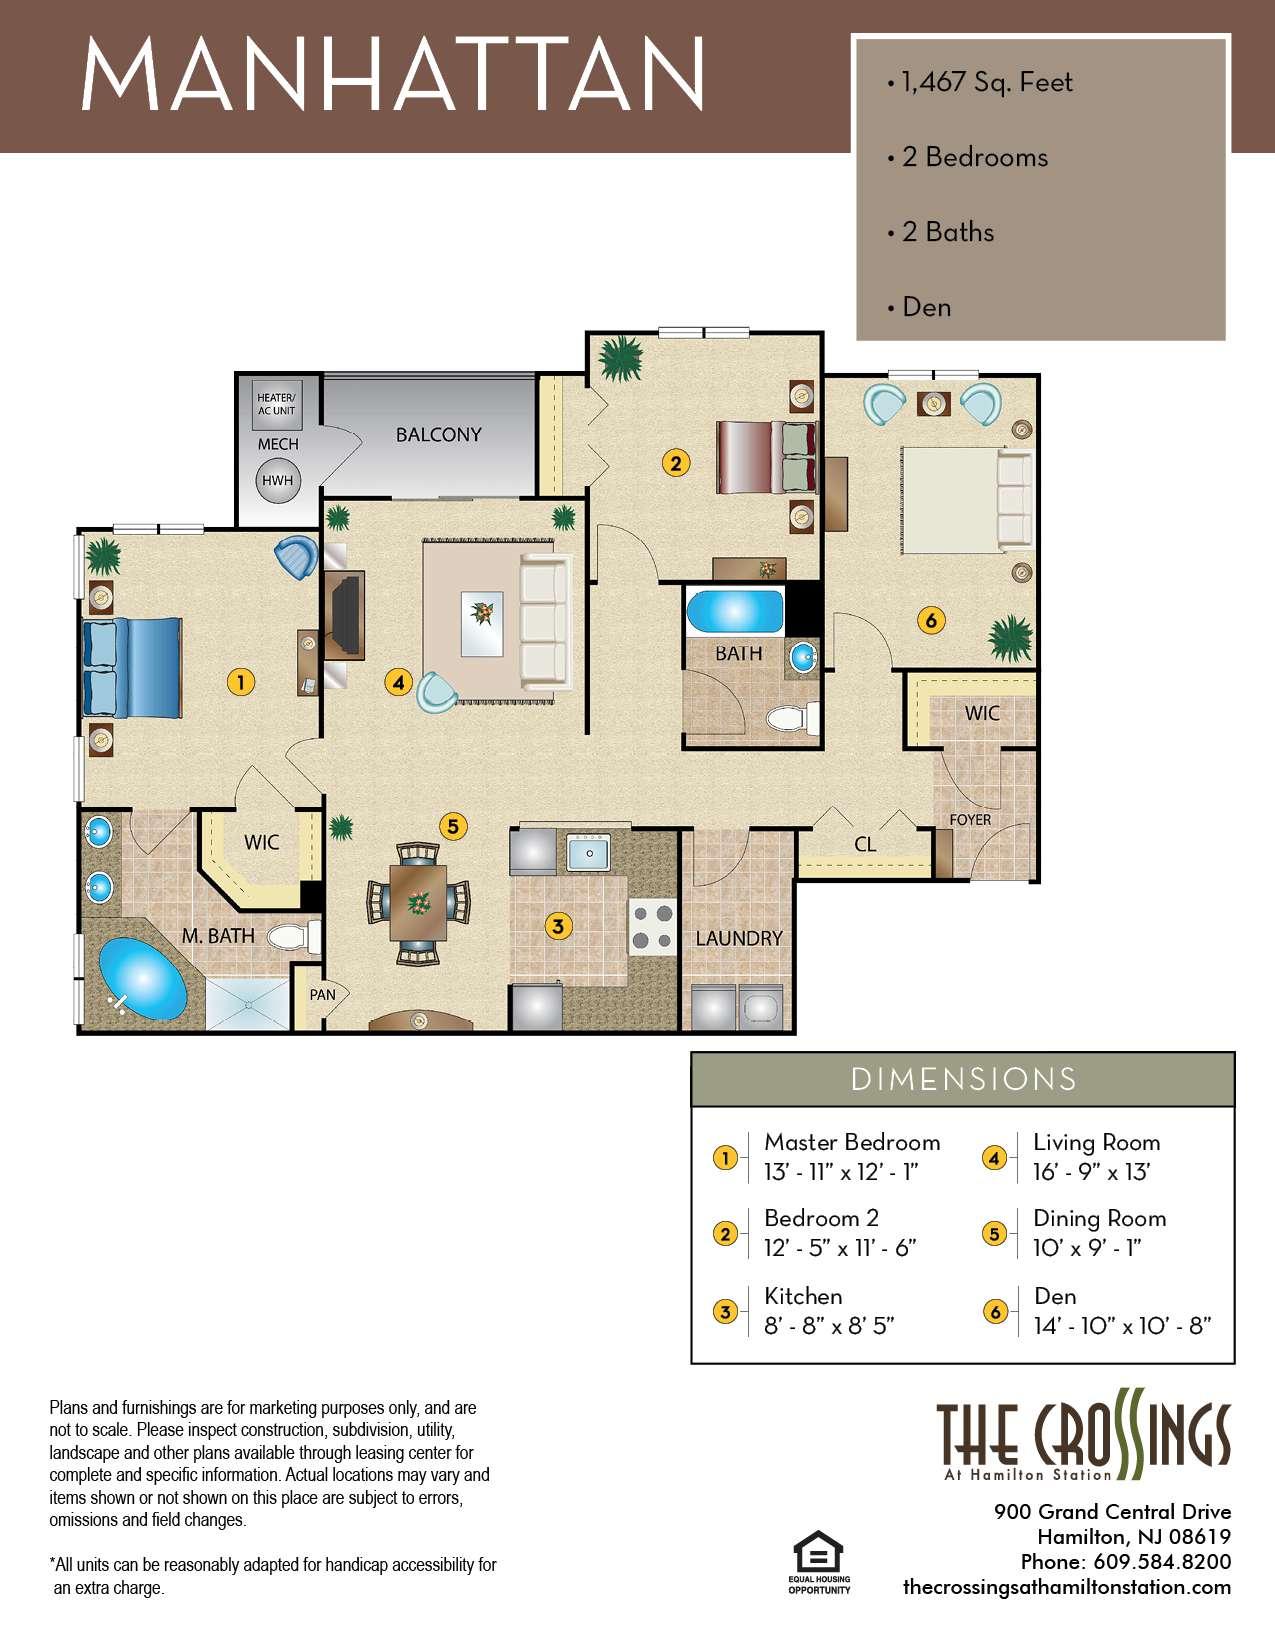 The Manhattan Floor Plan